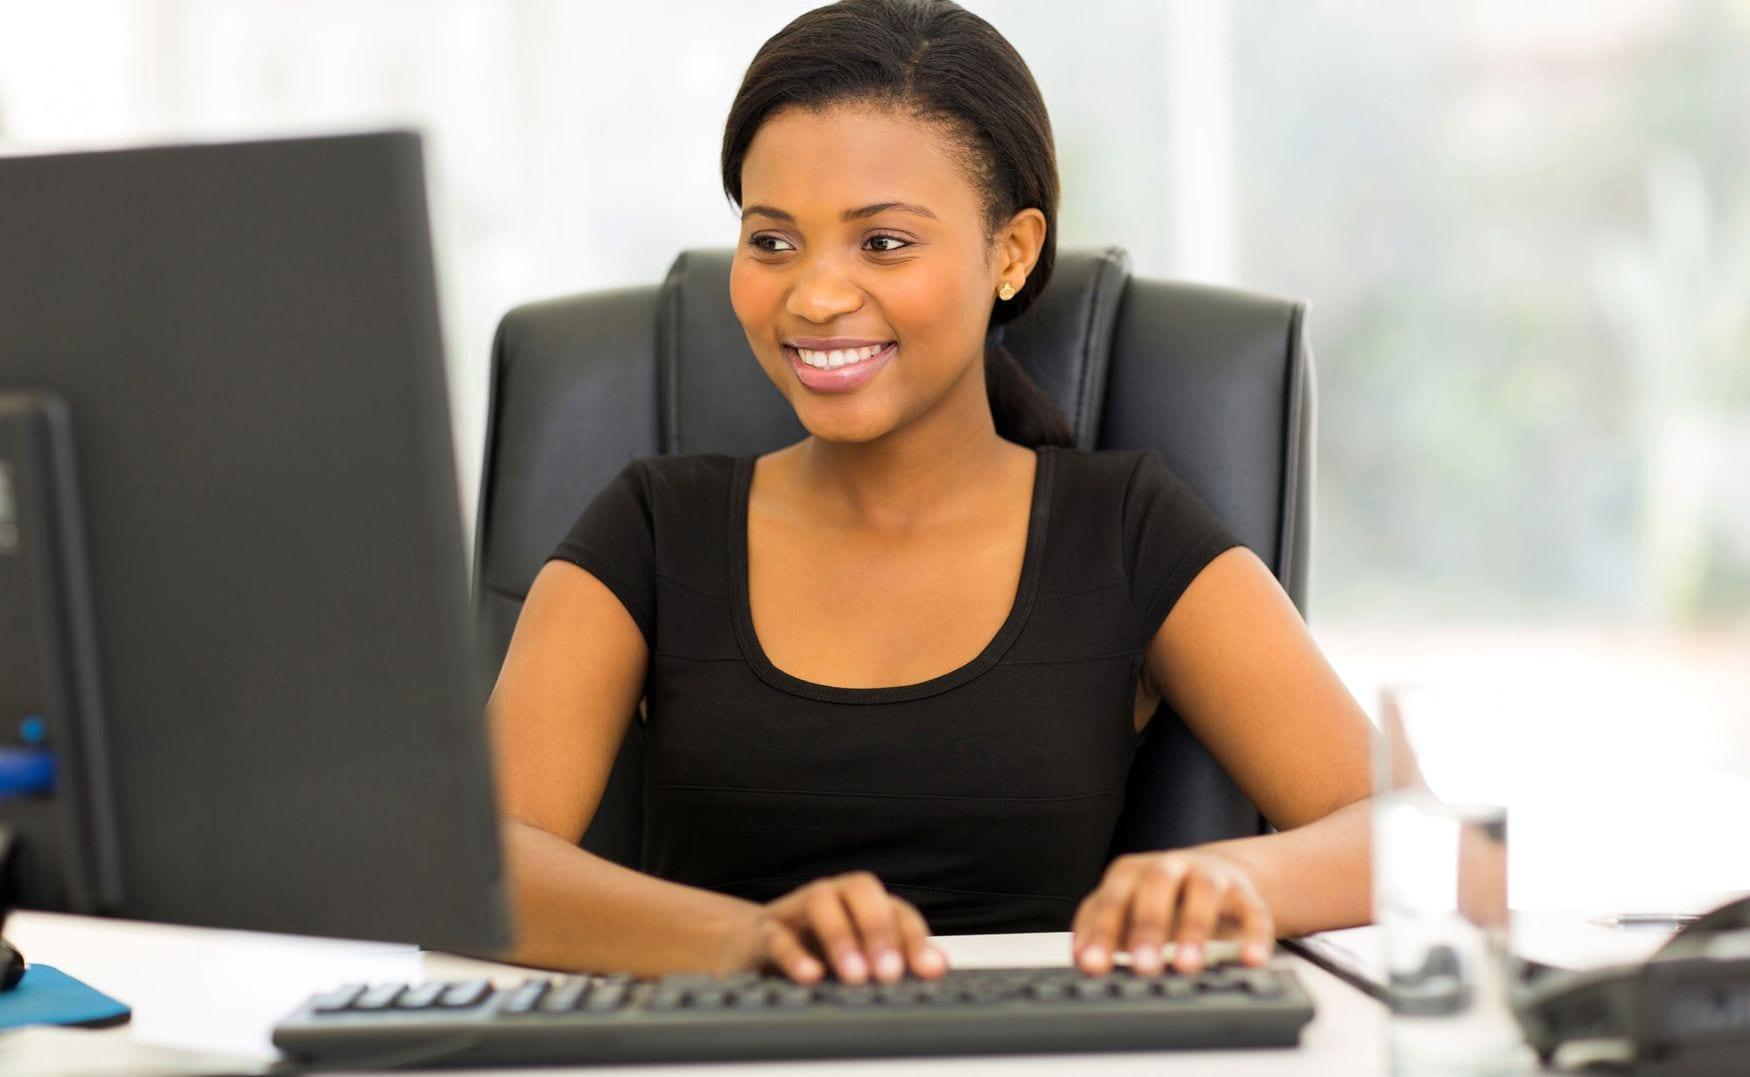 Laurus College Blog Post – Critical Skills: Keyboard & Accuracy